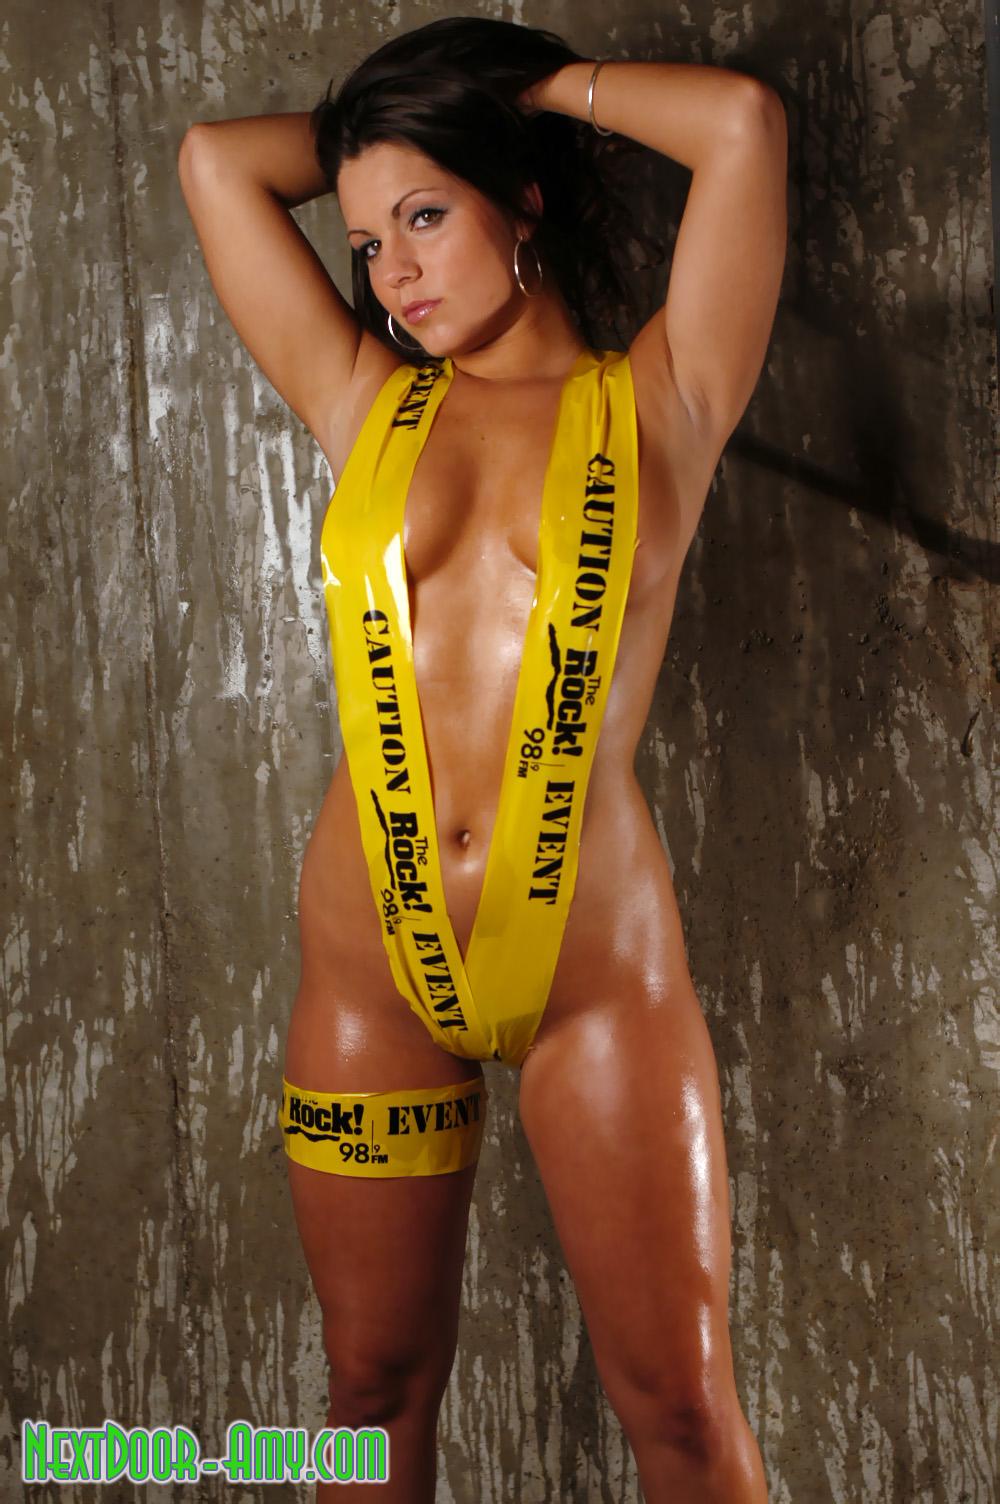 Bikini made with caution tape